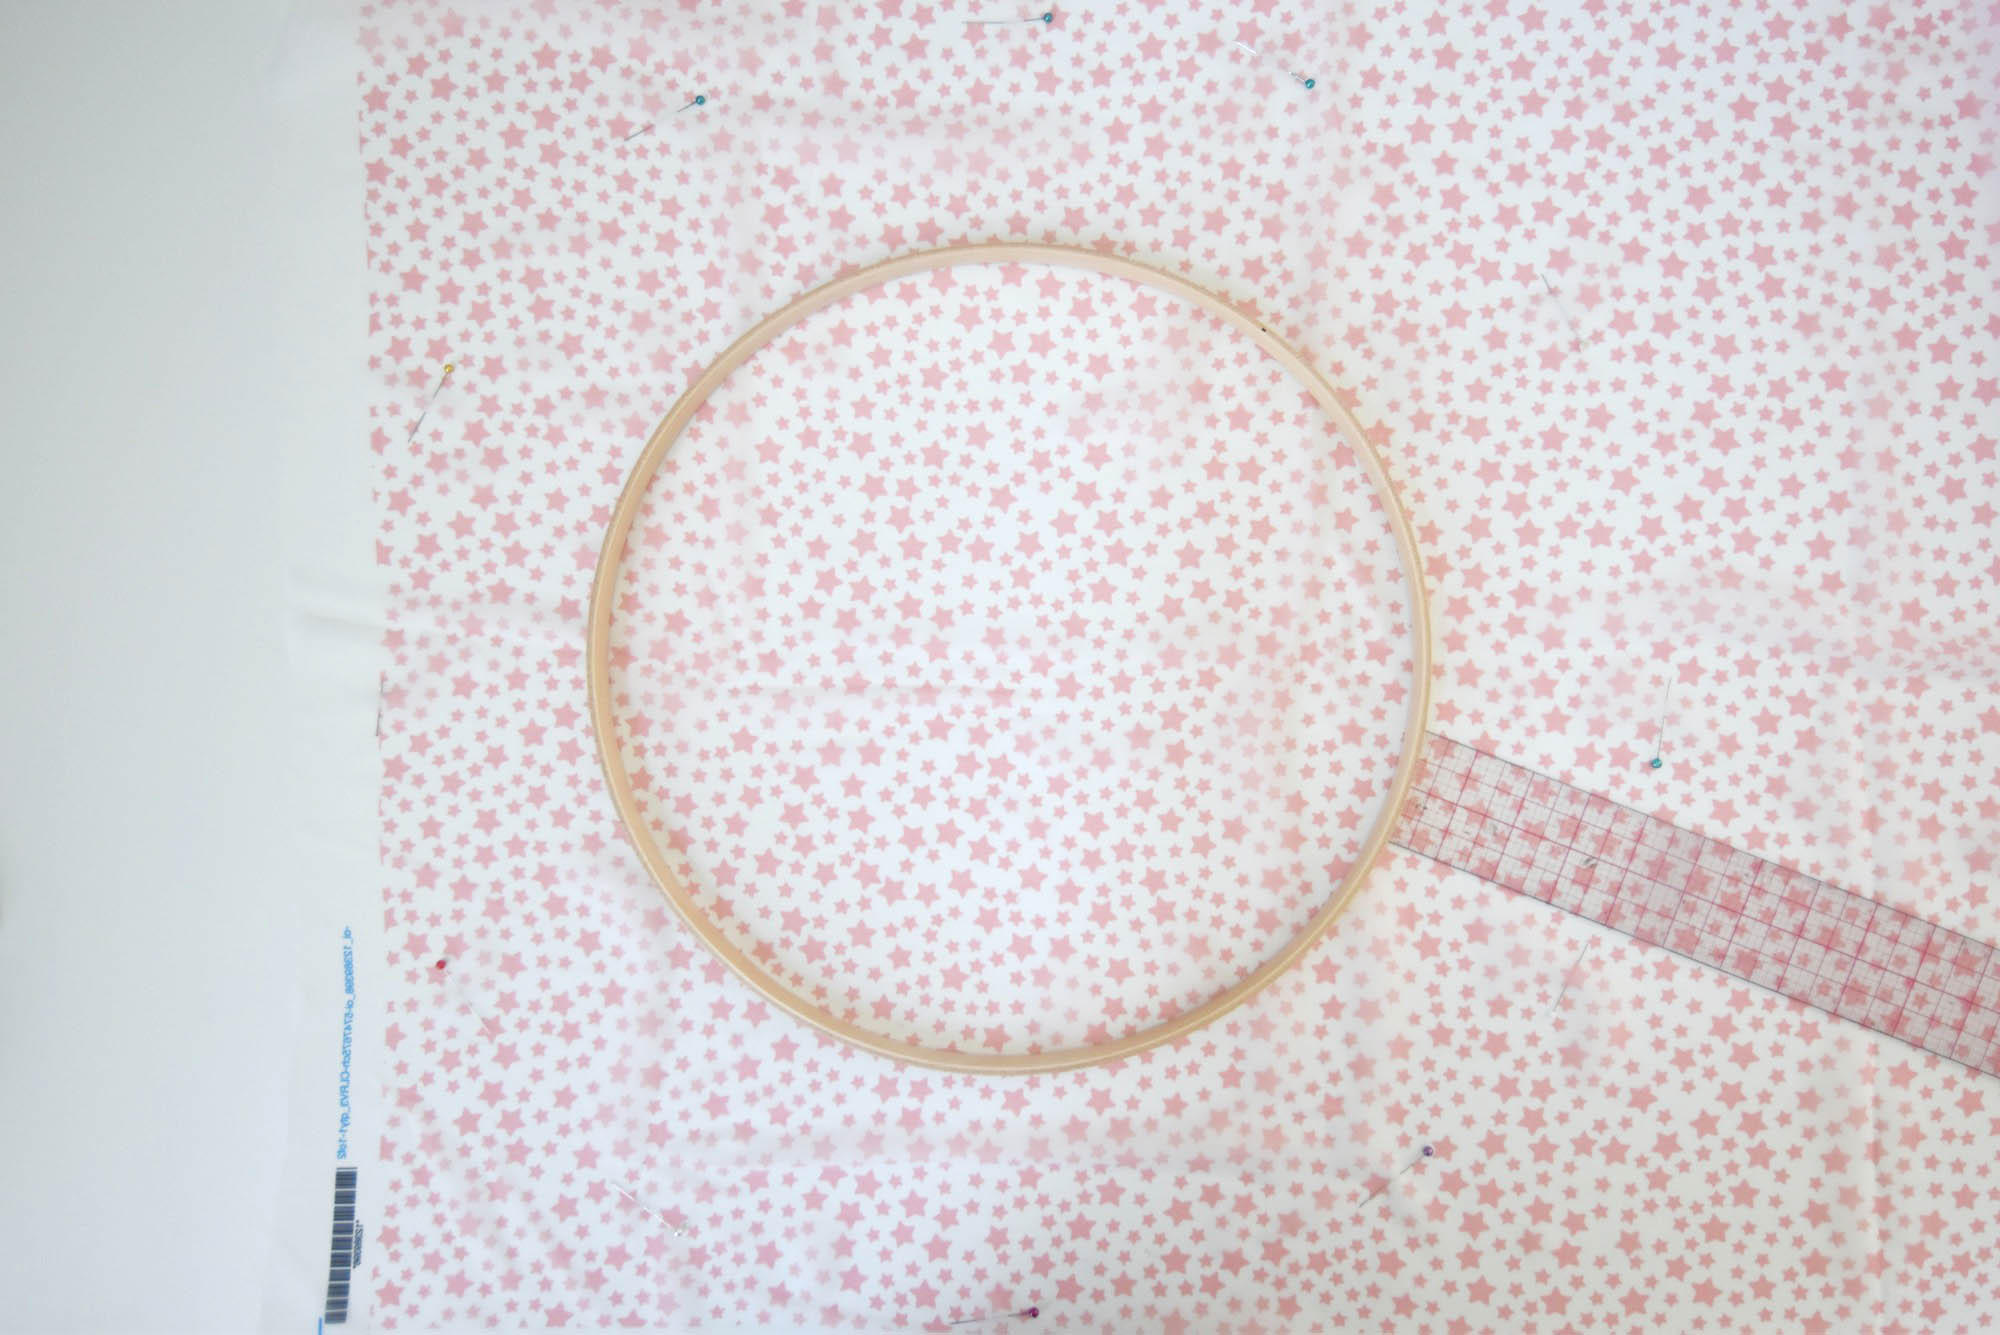 Sleep Under the Stars with a DIY Canopy | Spoonflower Blog